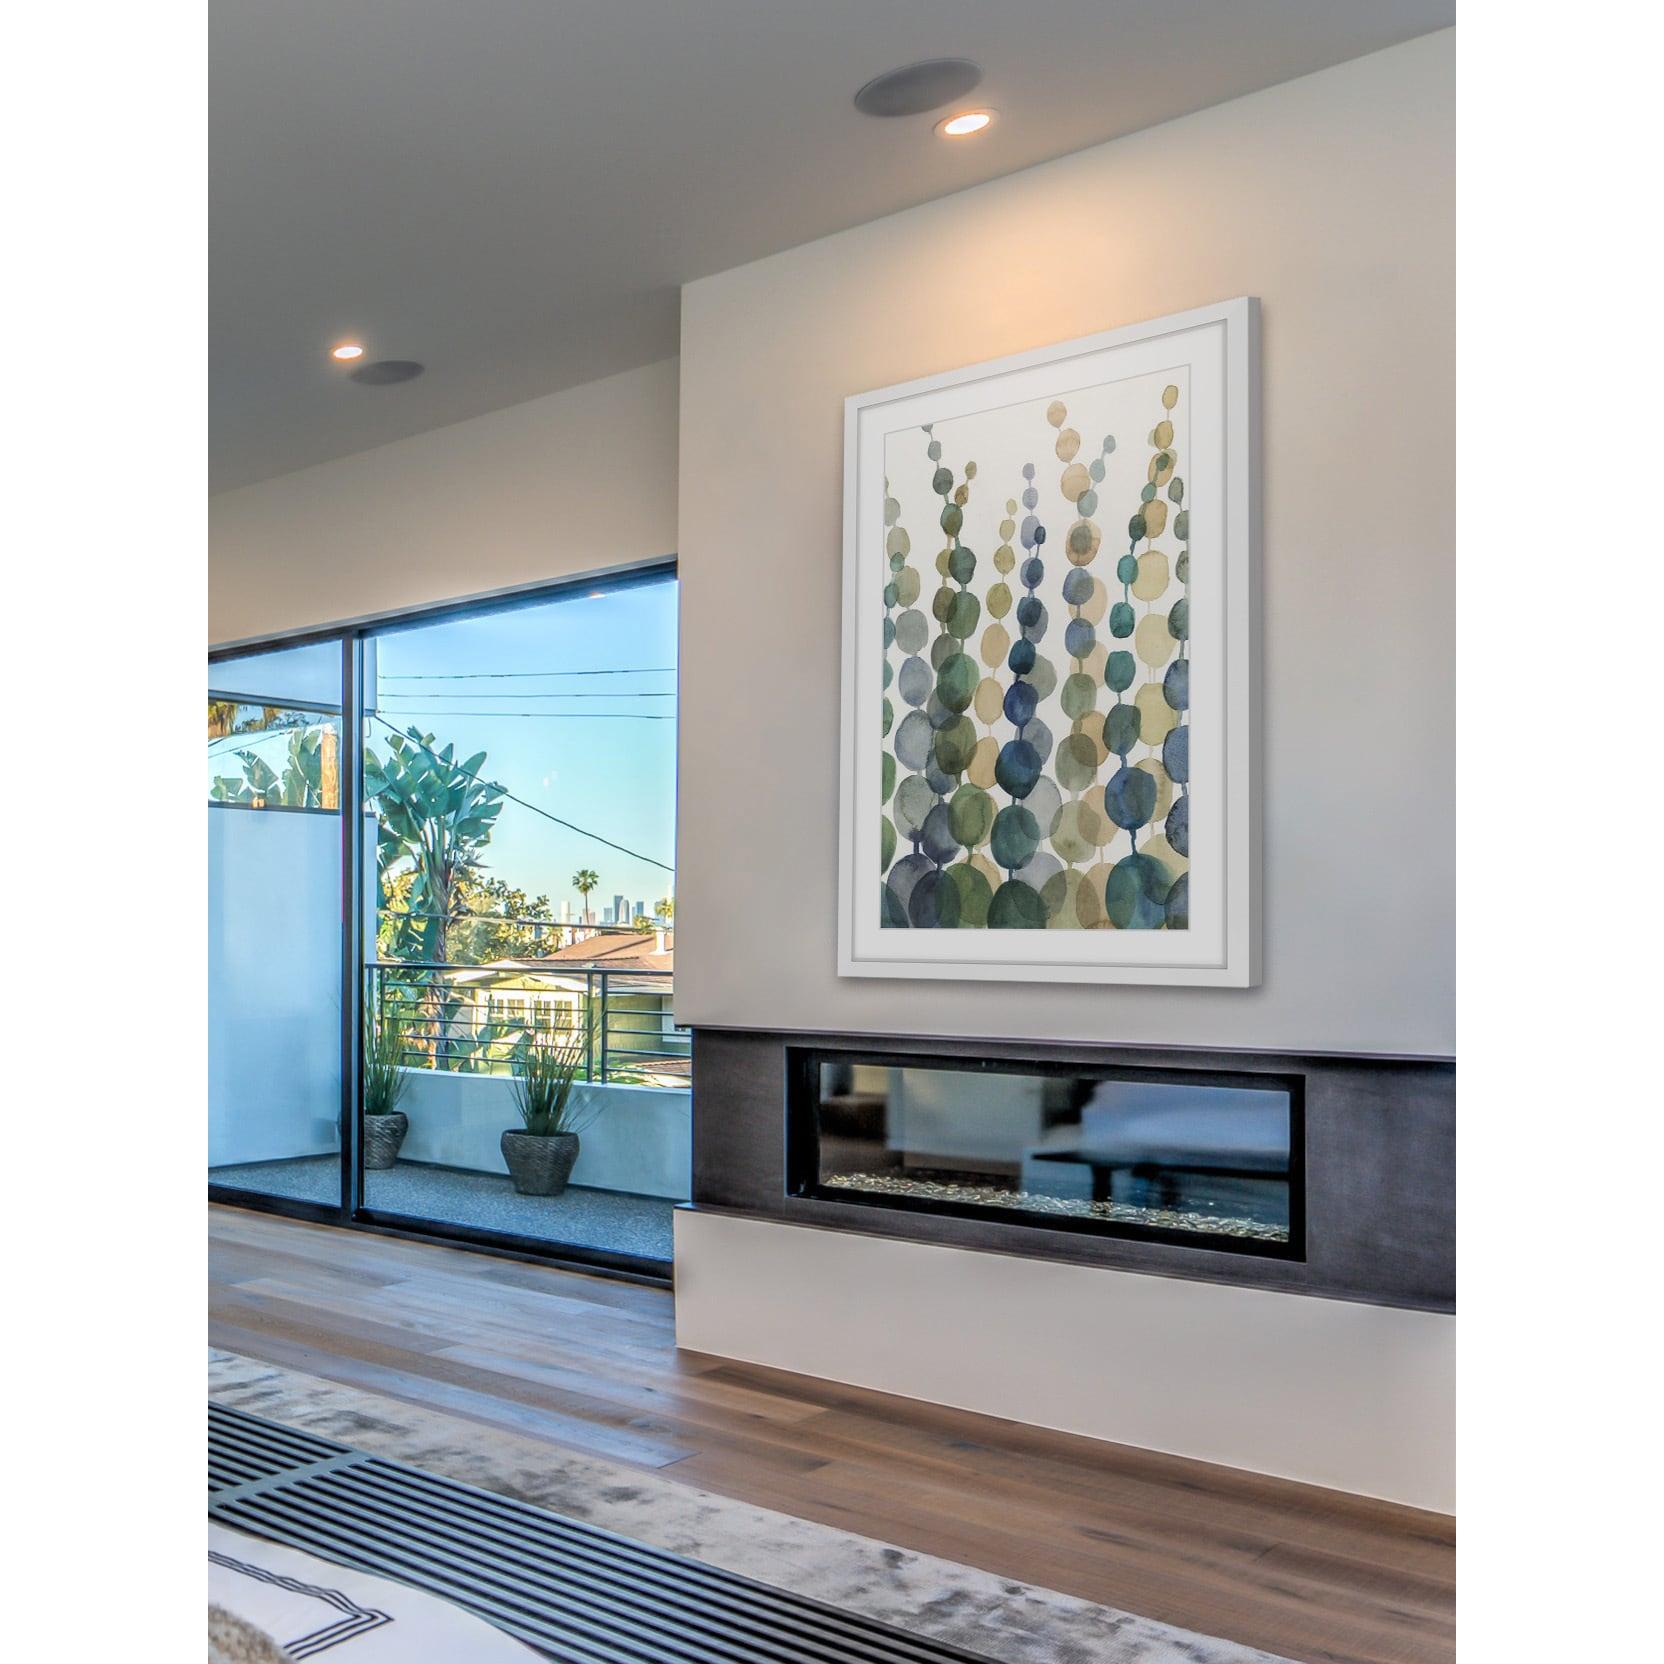 Marmont Hill - 'Pompom Botanical I' Framed Painting Print